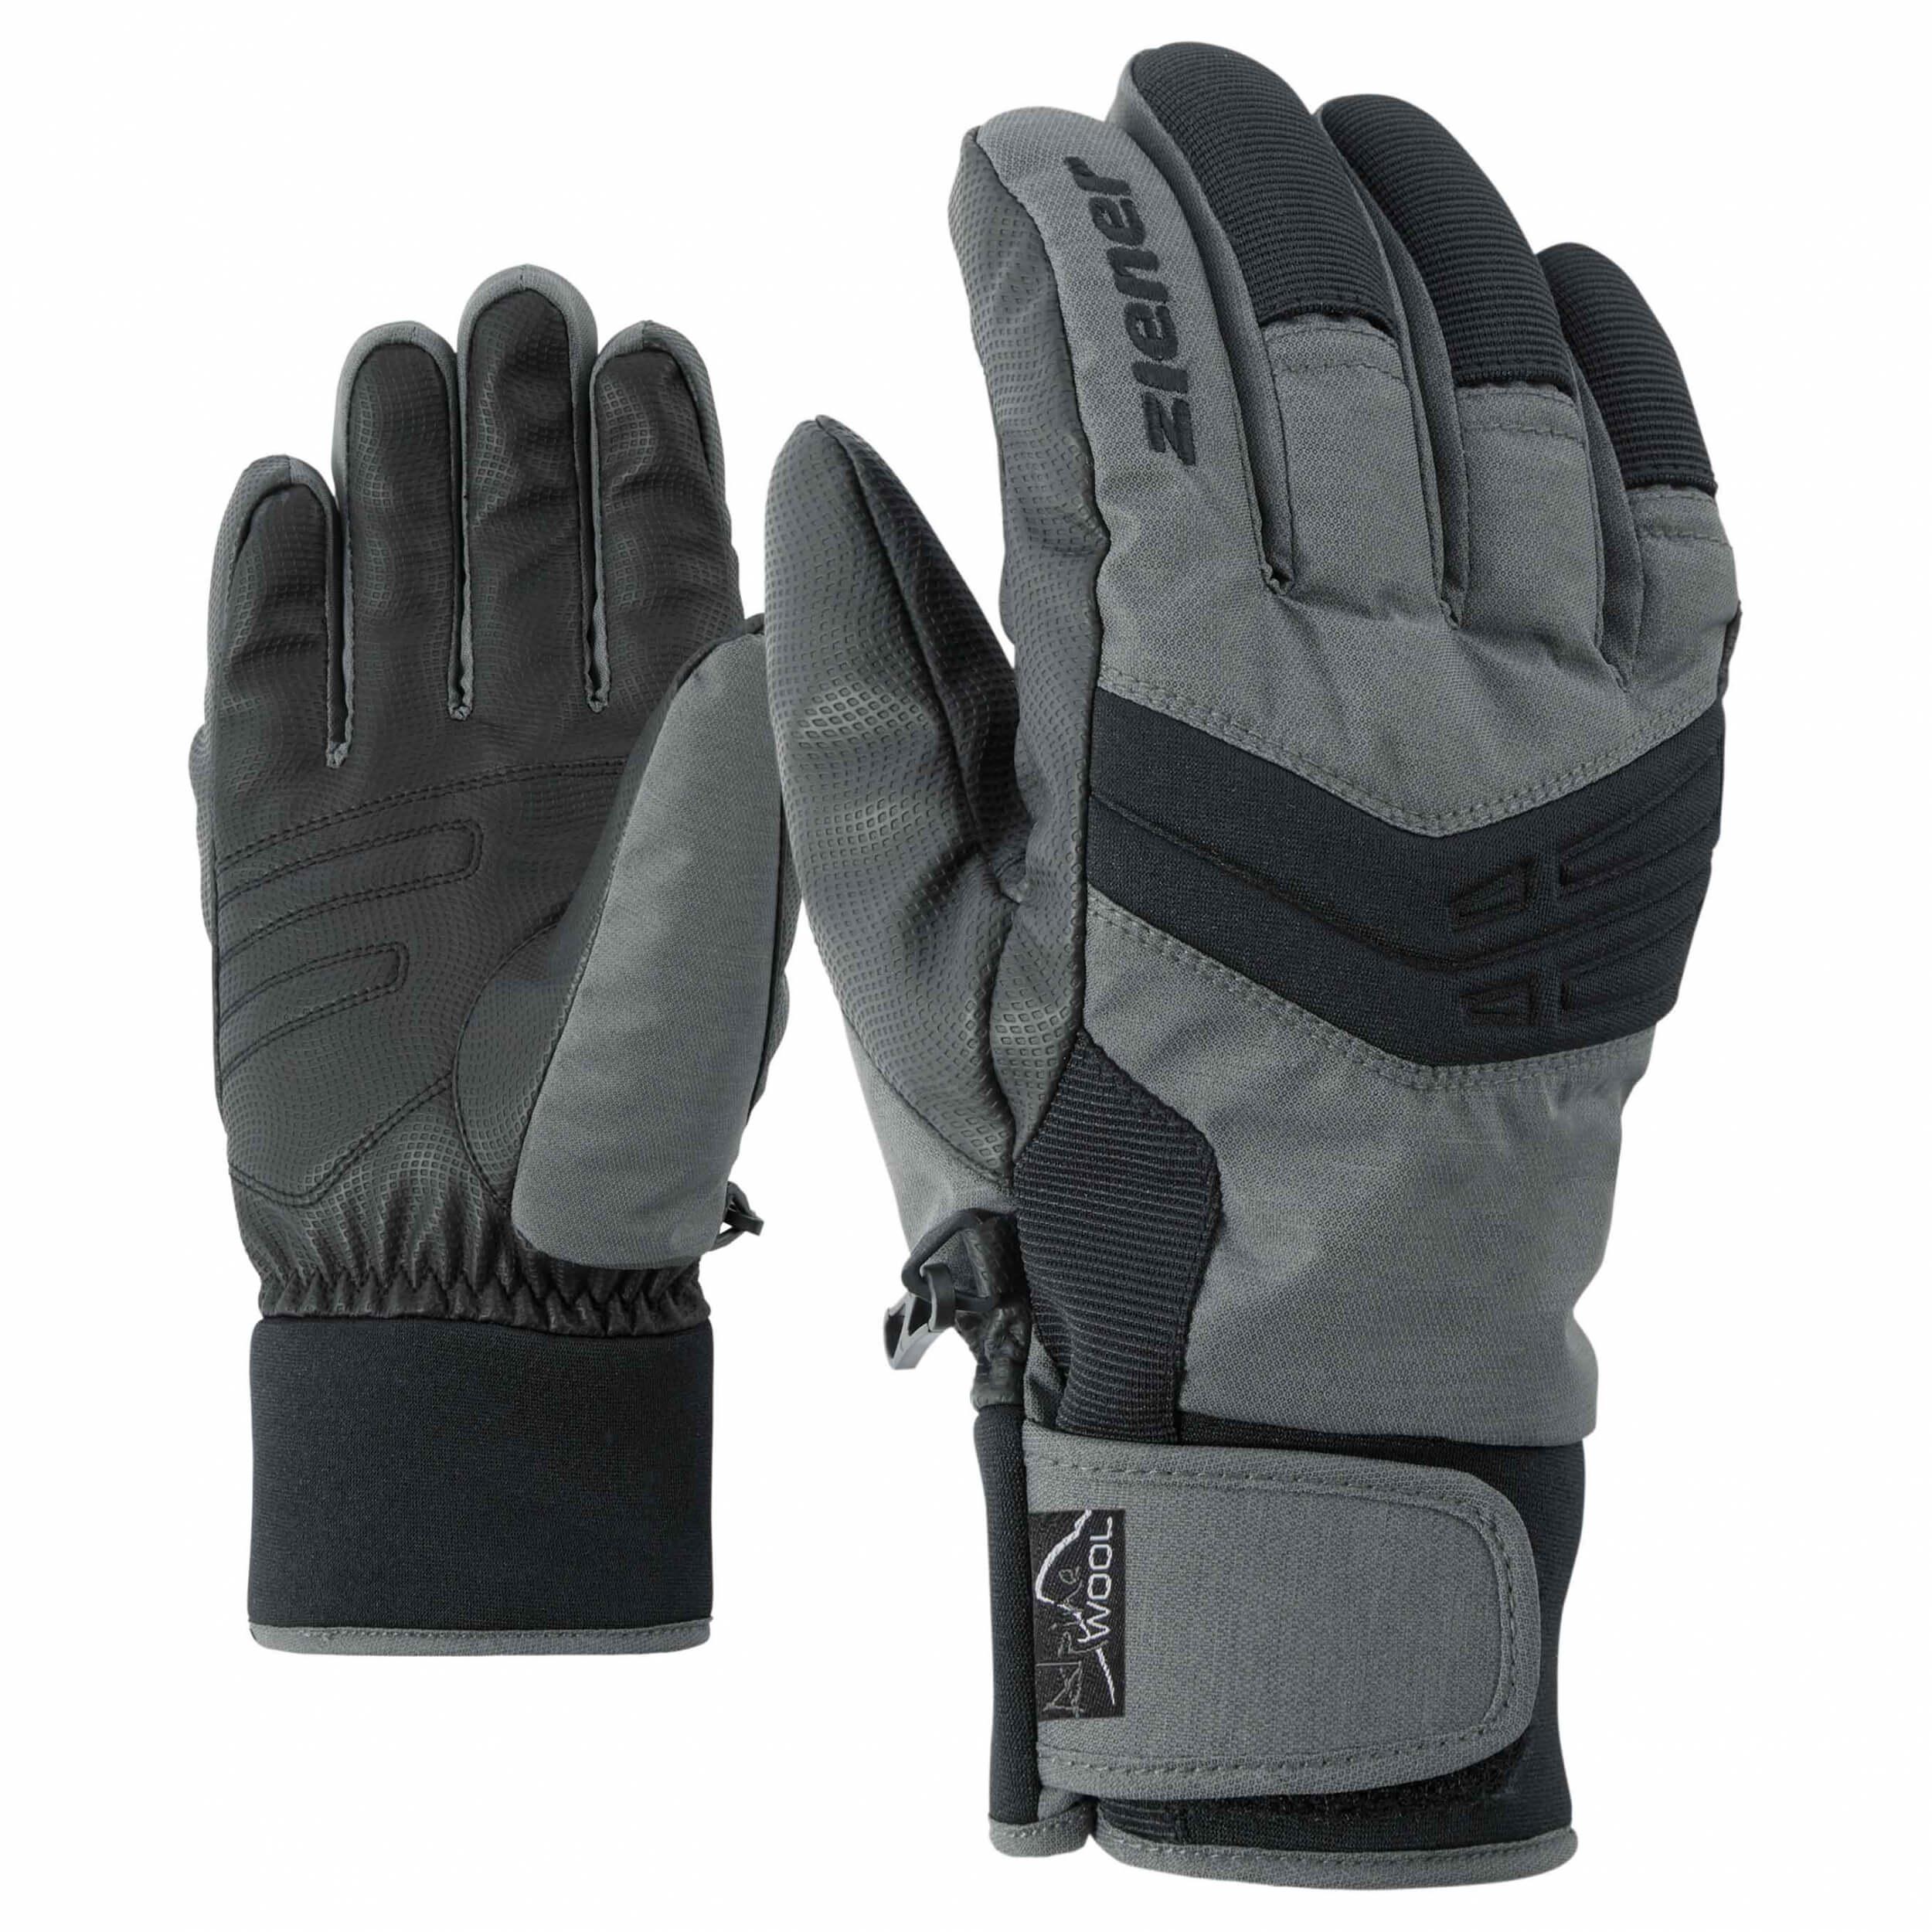 ZIENER Ski Handschuhe extra warm Ginom grau 817